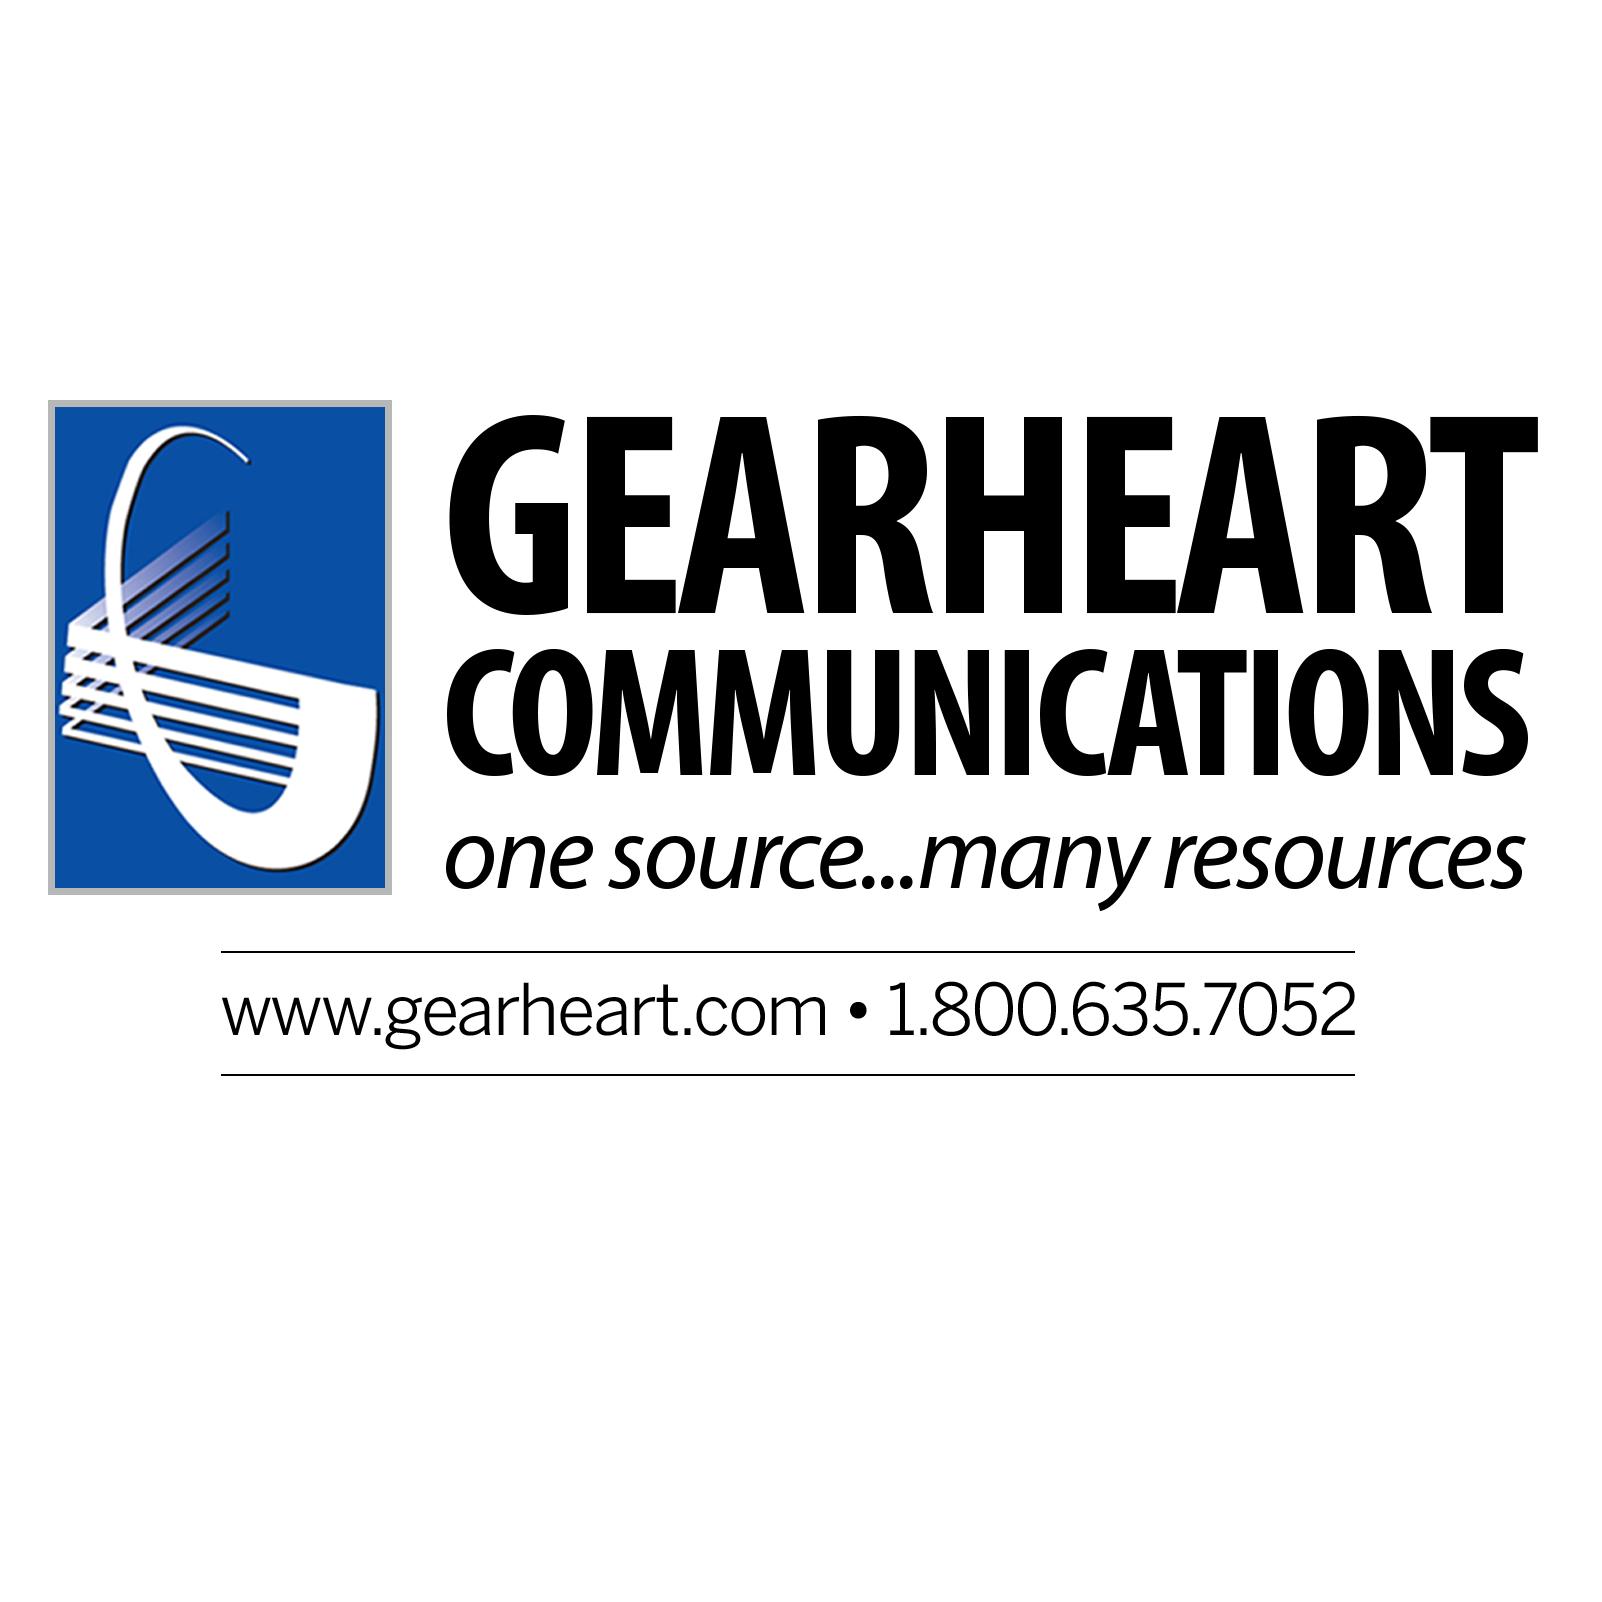 Gearheart Communications